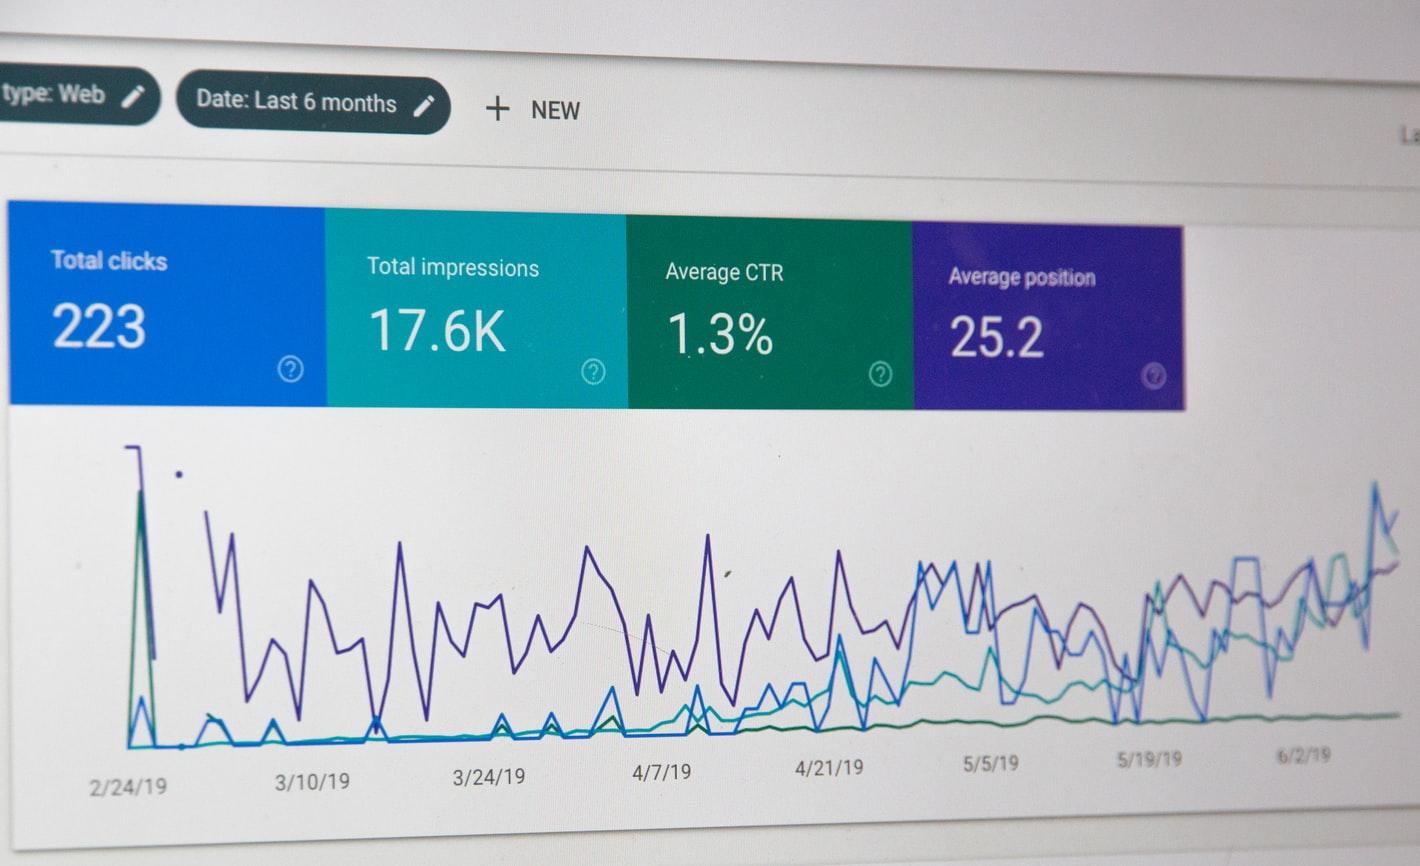 Screenshot of PPC metrics: Clicks and Impressions